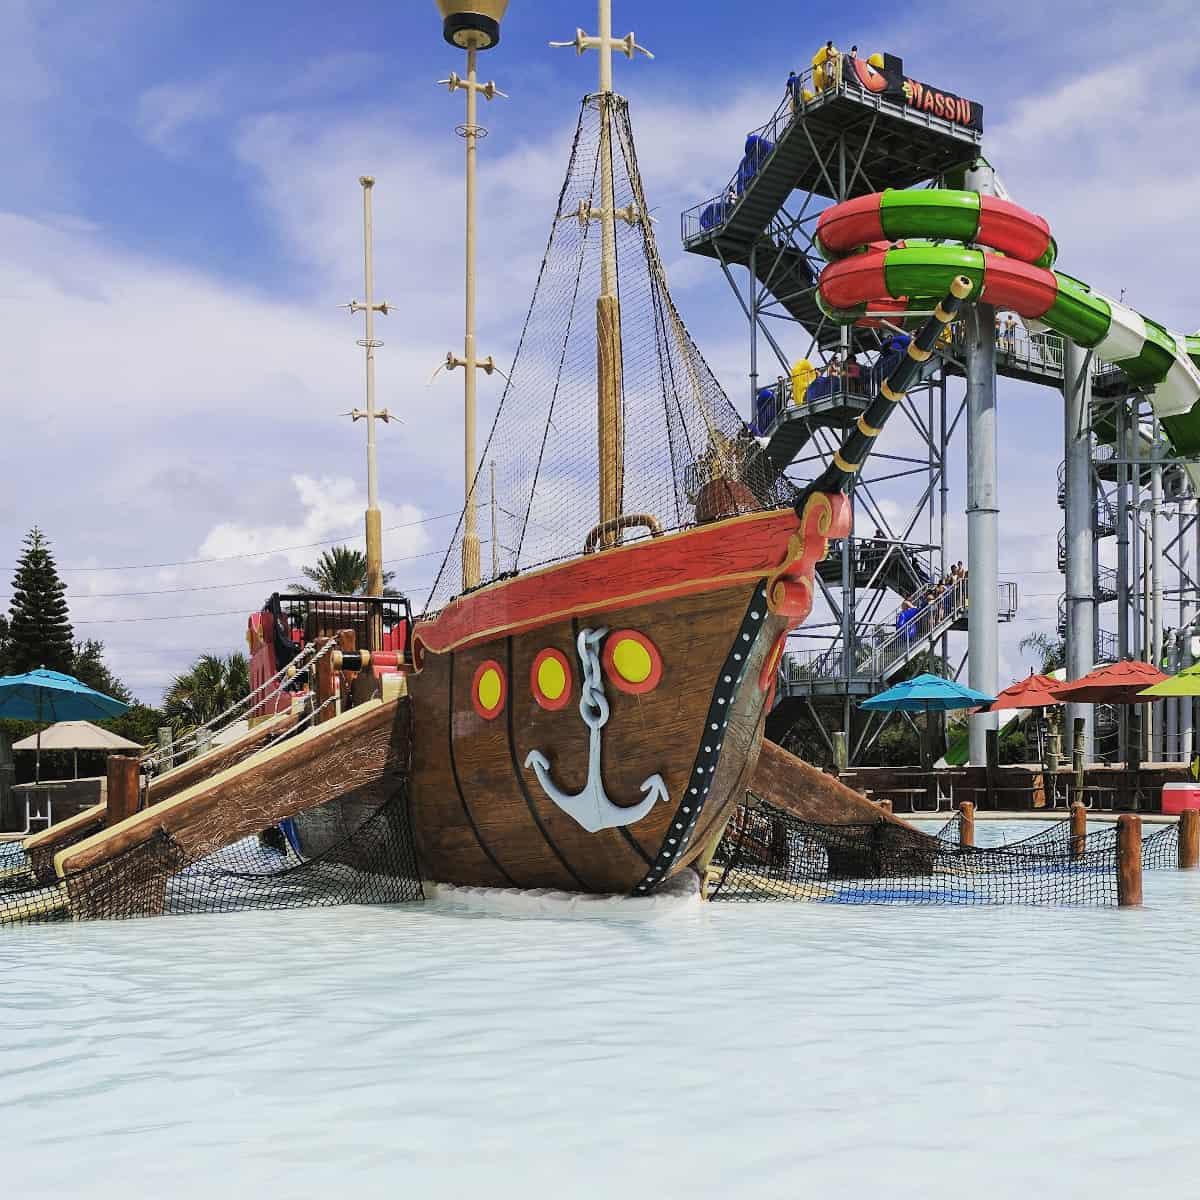 Schlitterbahn Galveston Pirate Ship